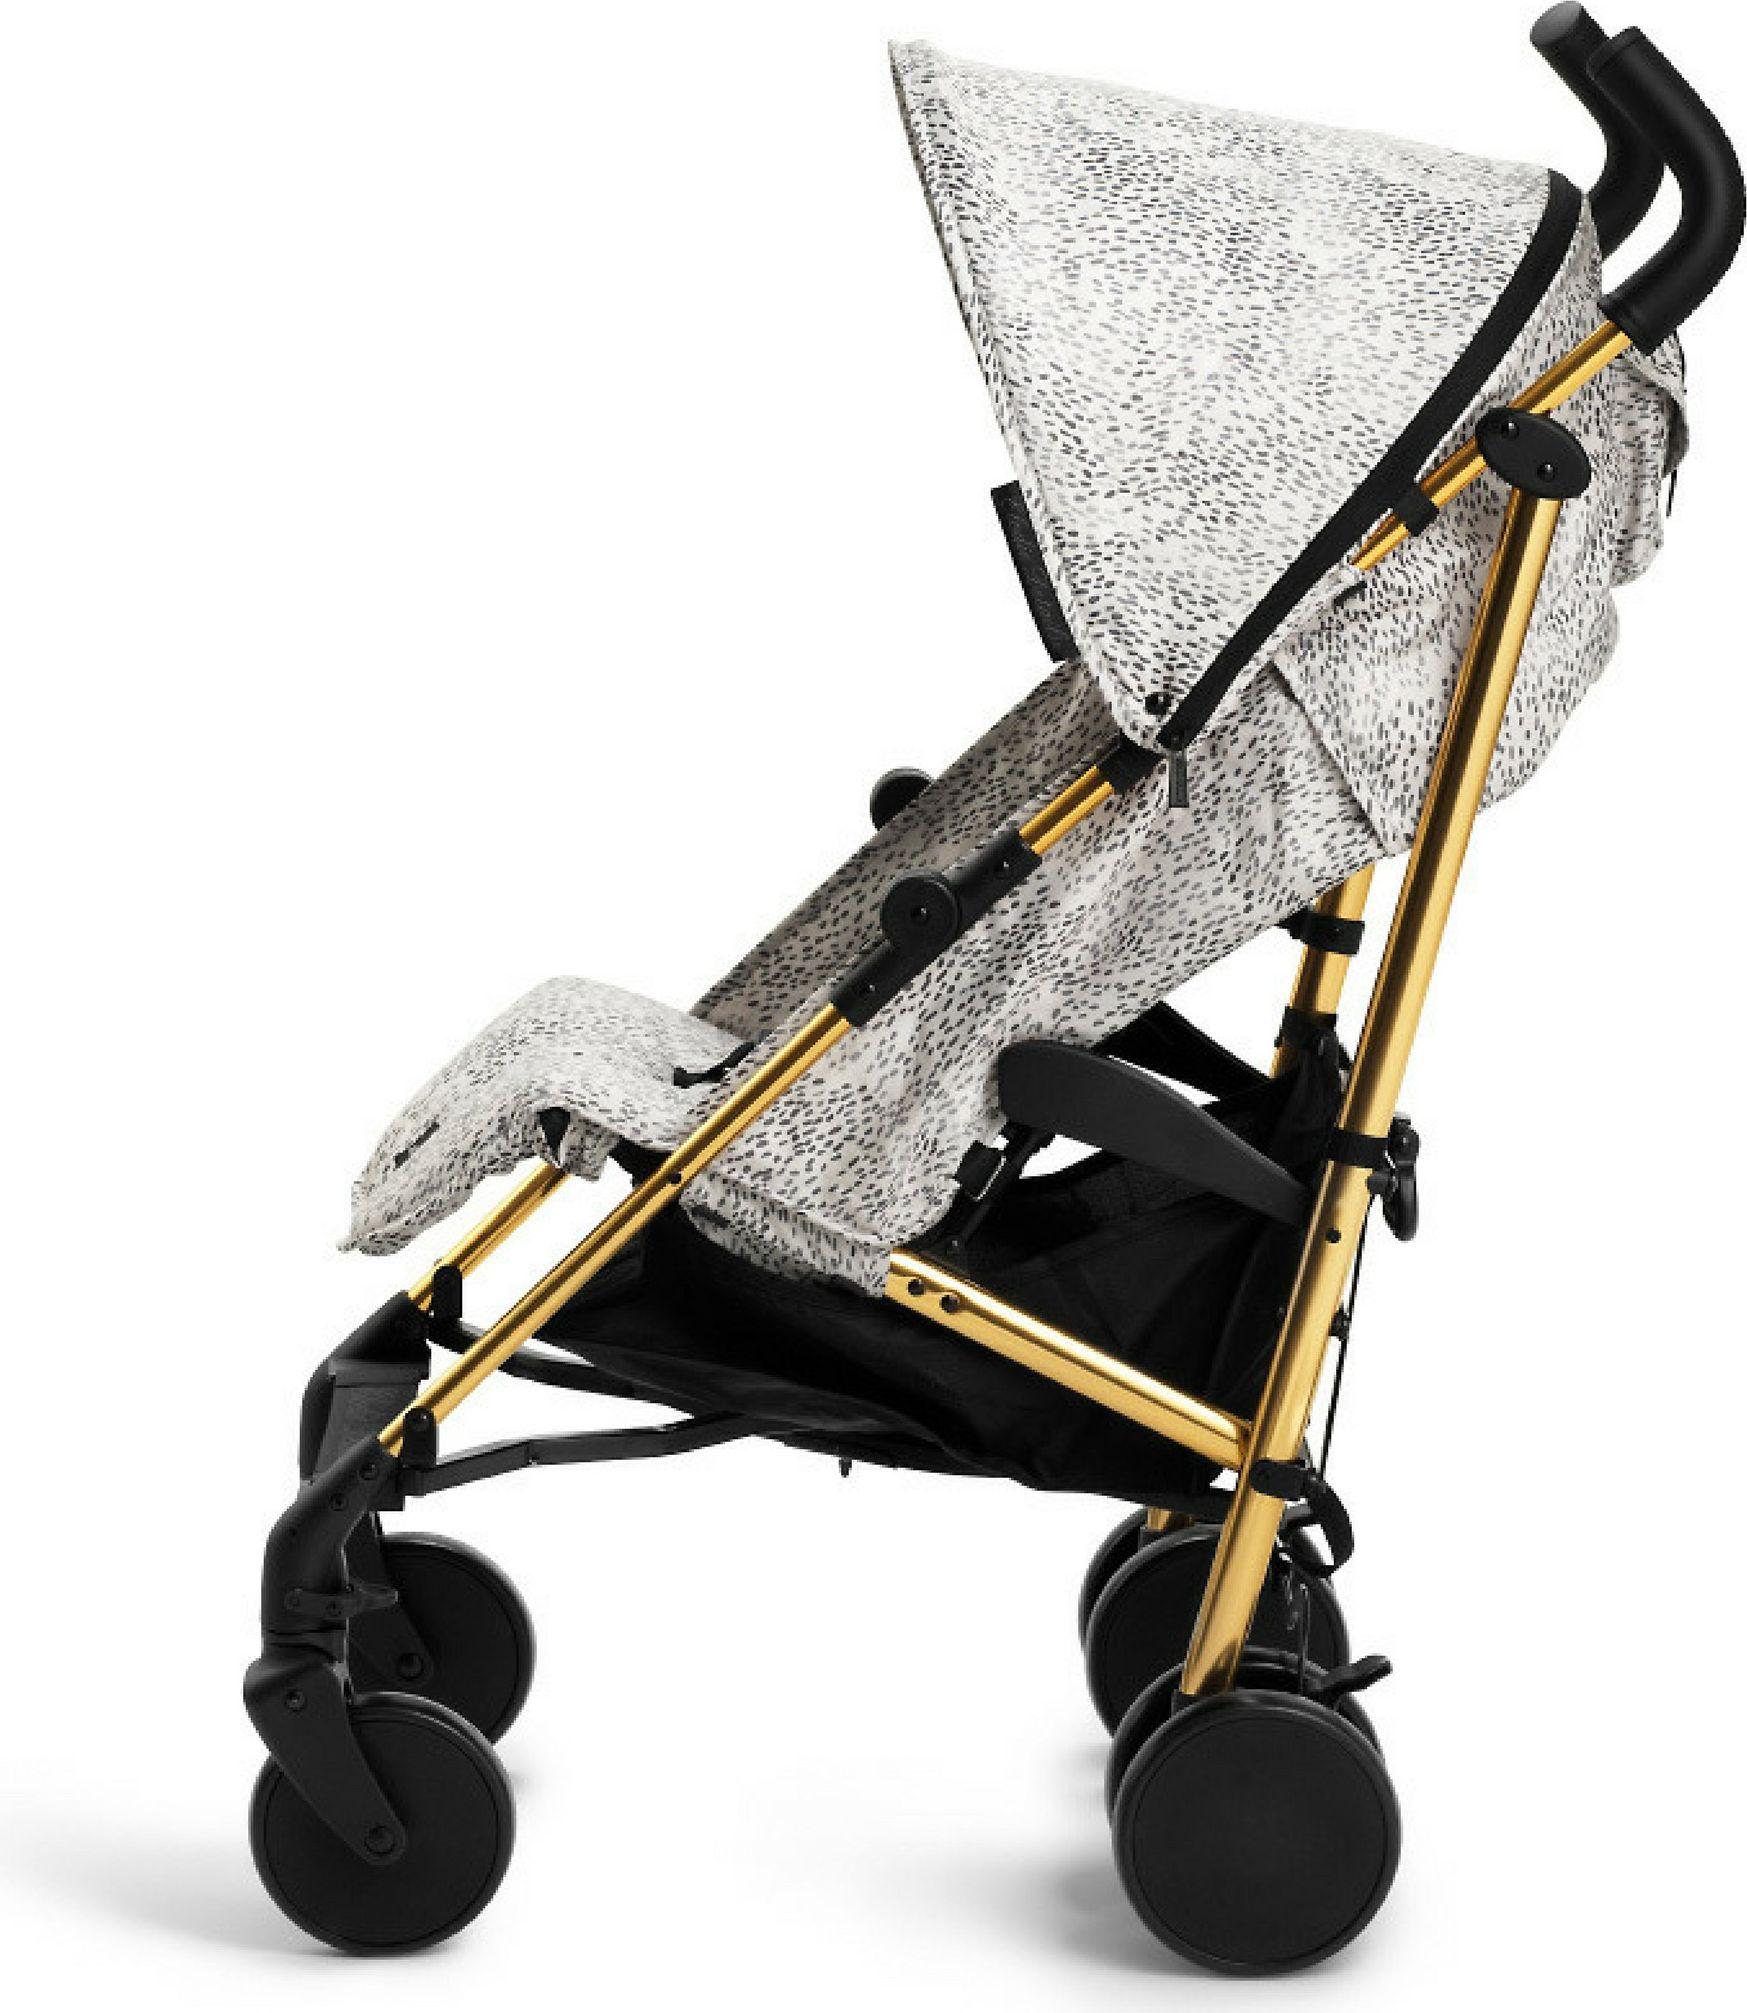 Wozek Elodie Details Elodie Details - Stockholm Stroller Dots of Fauna 7350041678250 bērnu ratiņi